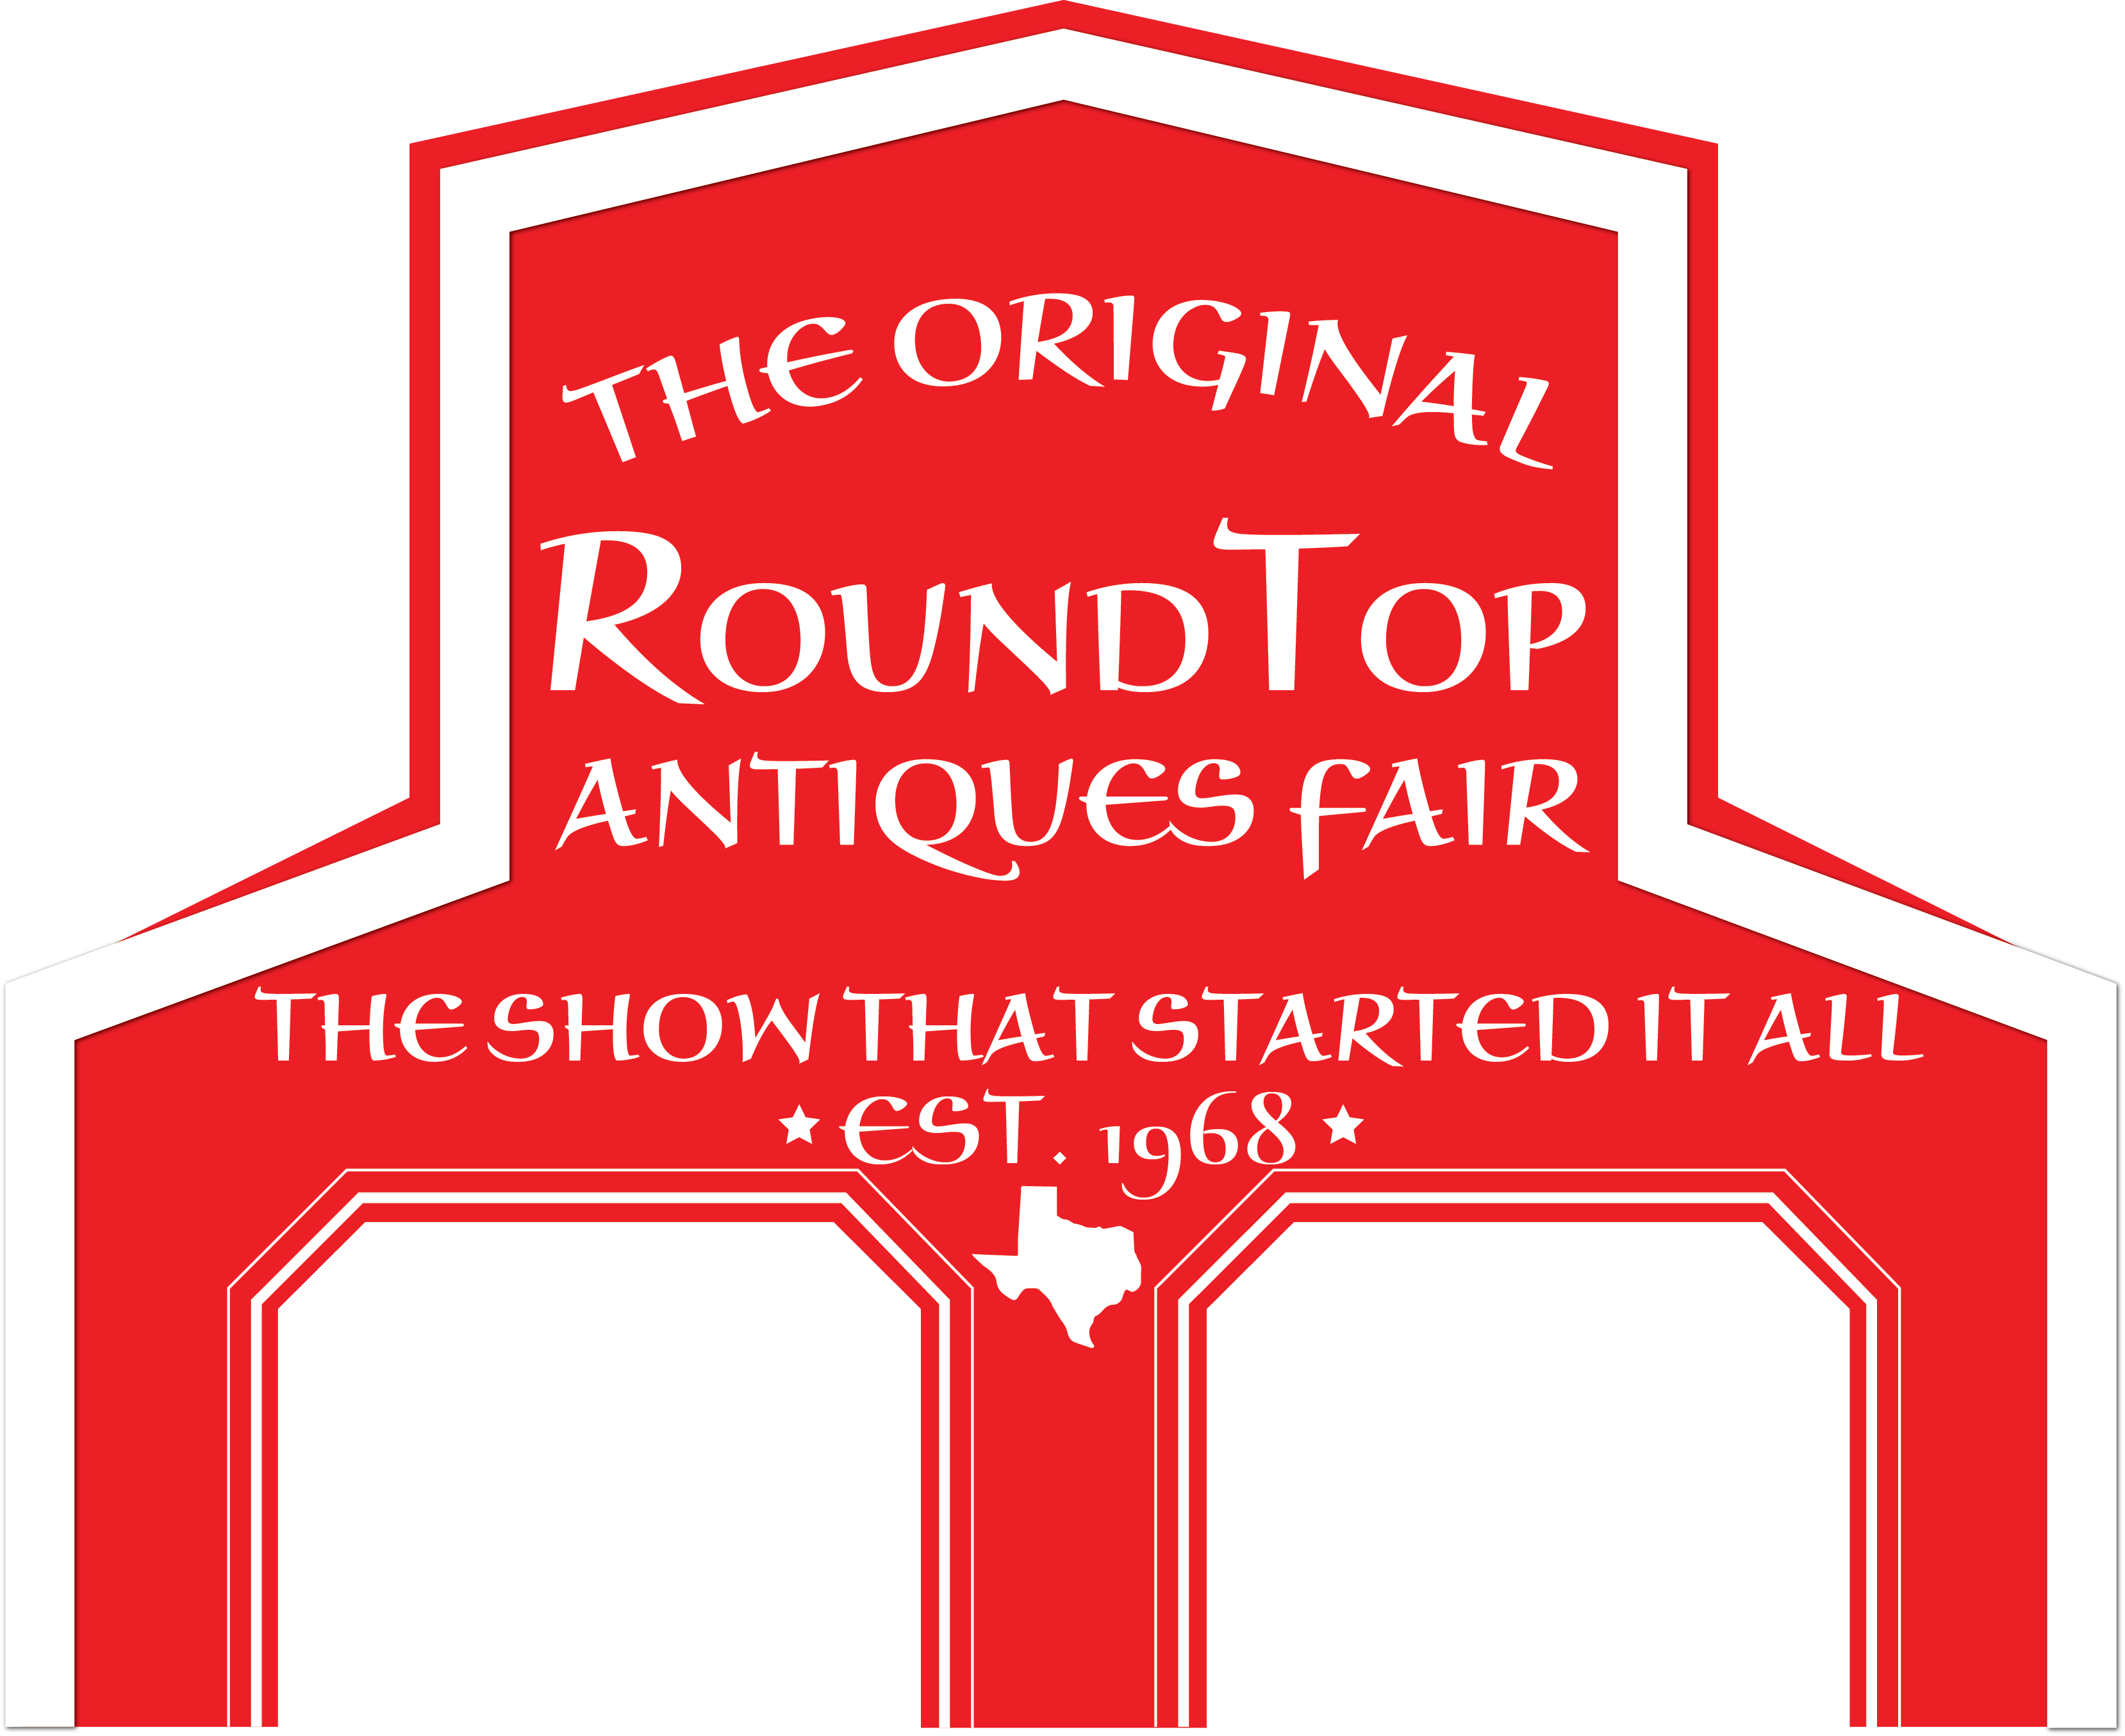 Round Top Antique Fair 2020.Original Round Top Antiques Fair Round Top Texas 50yrs